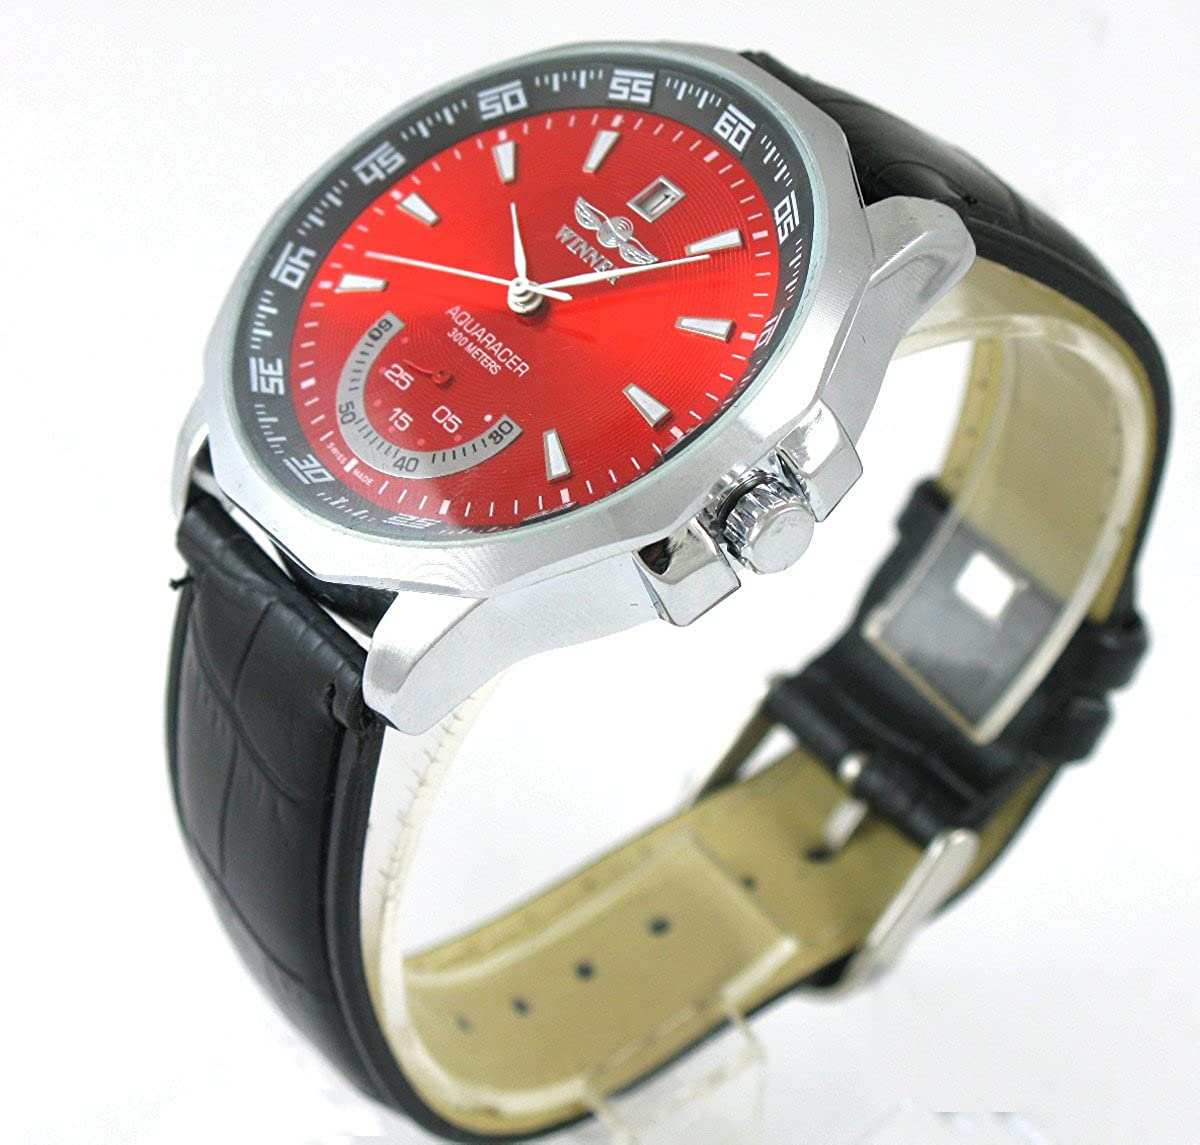 Vigorosoメンズ高級自動巻きムーブメントの手首腕時計 B00UTCT4NS